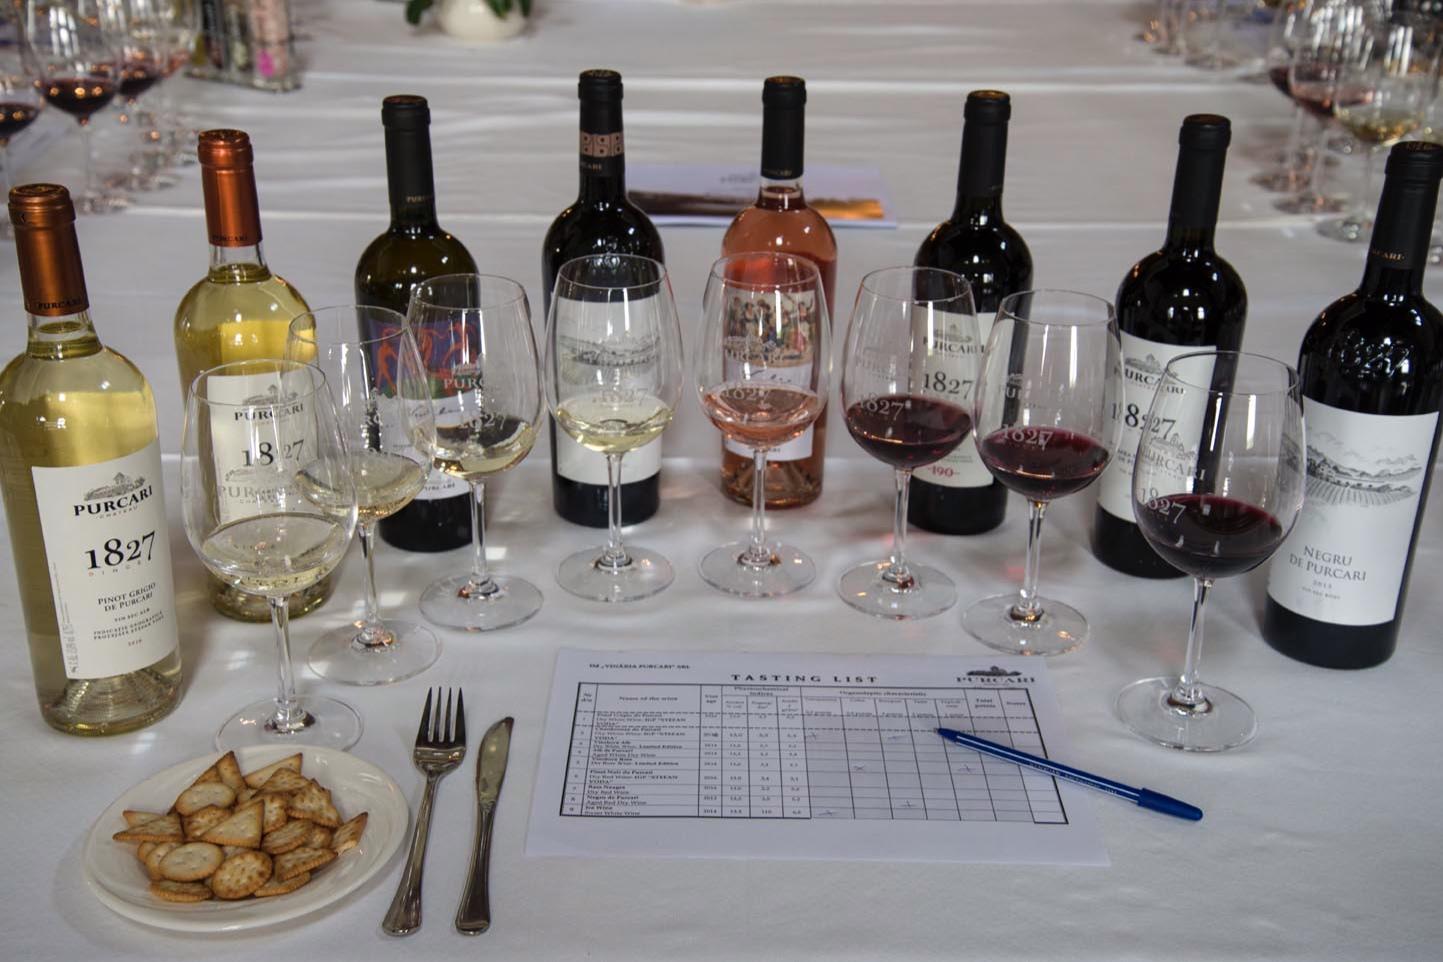 Chateau+Purcari+wine+tasting.jpg